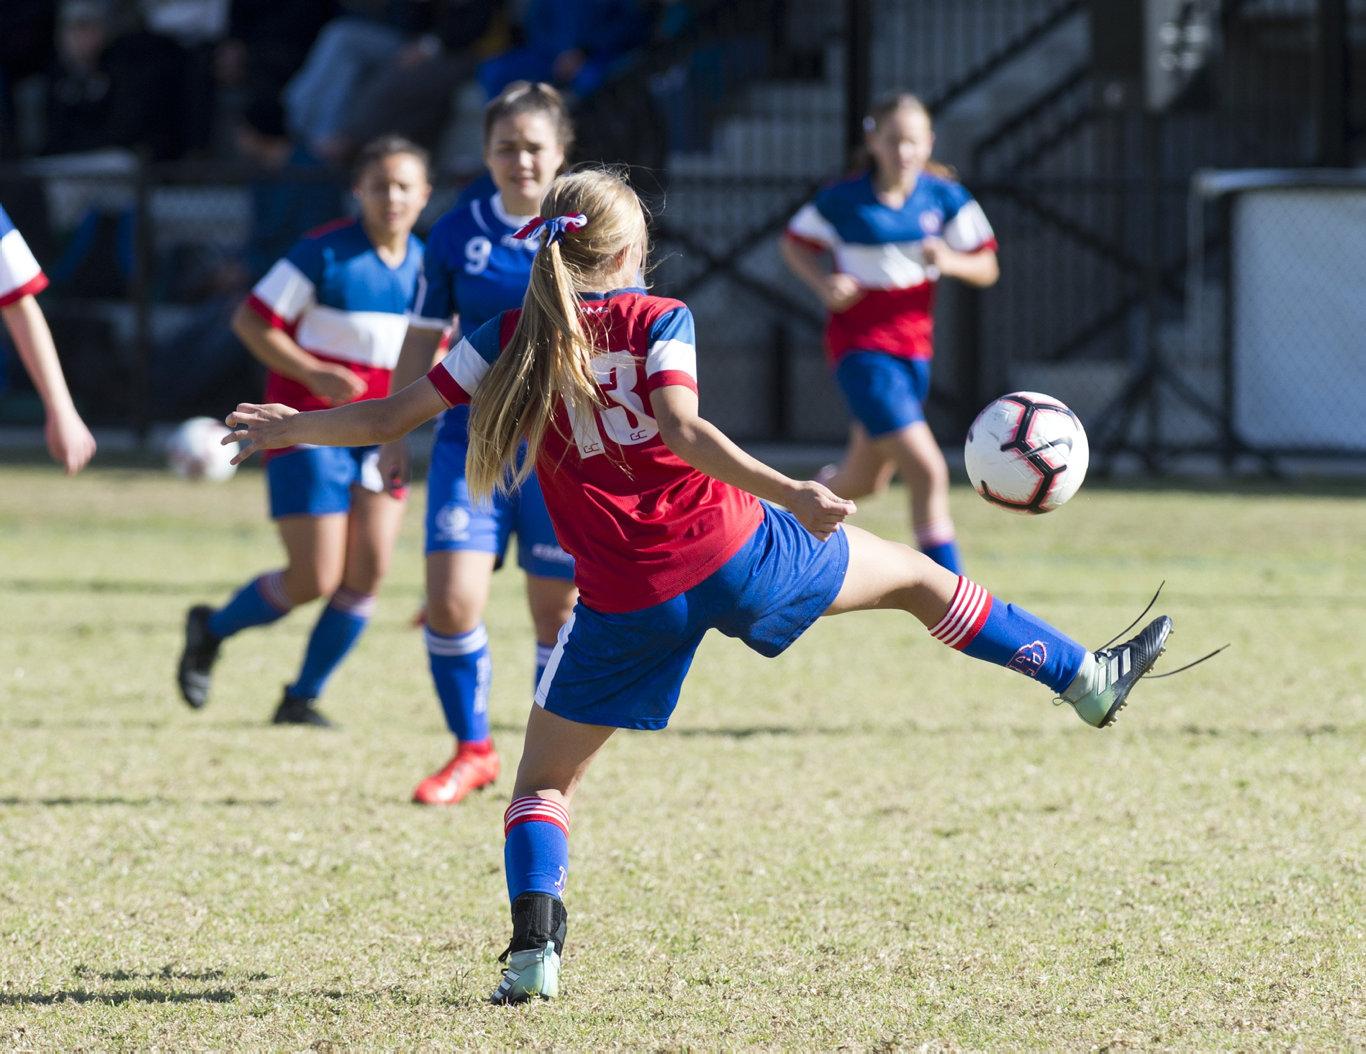 Maddison Teakle has been named in the Queensland 13-15 years schoolgirls football team.